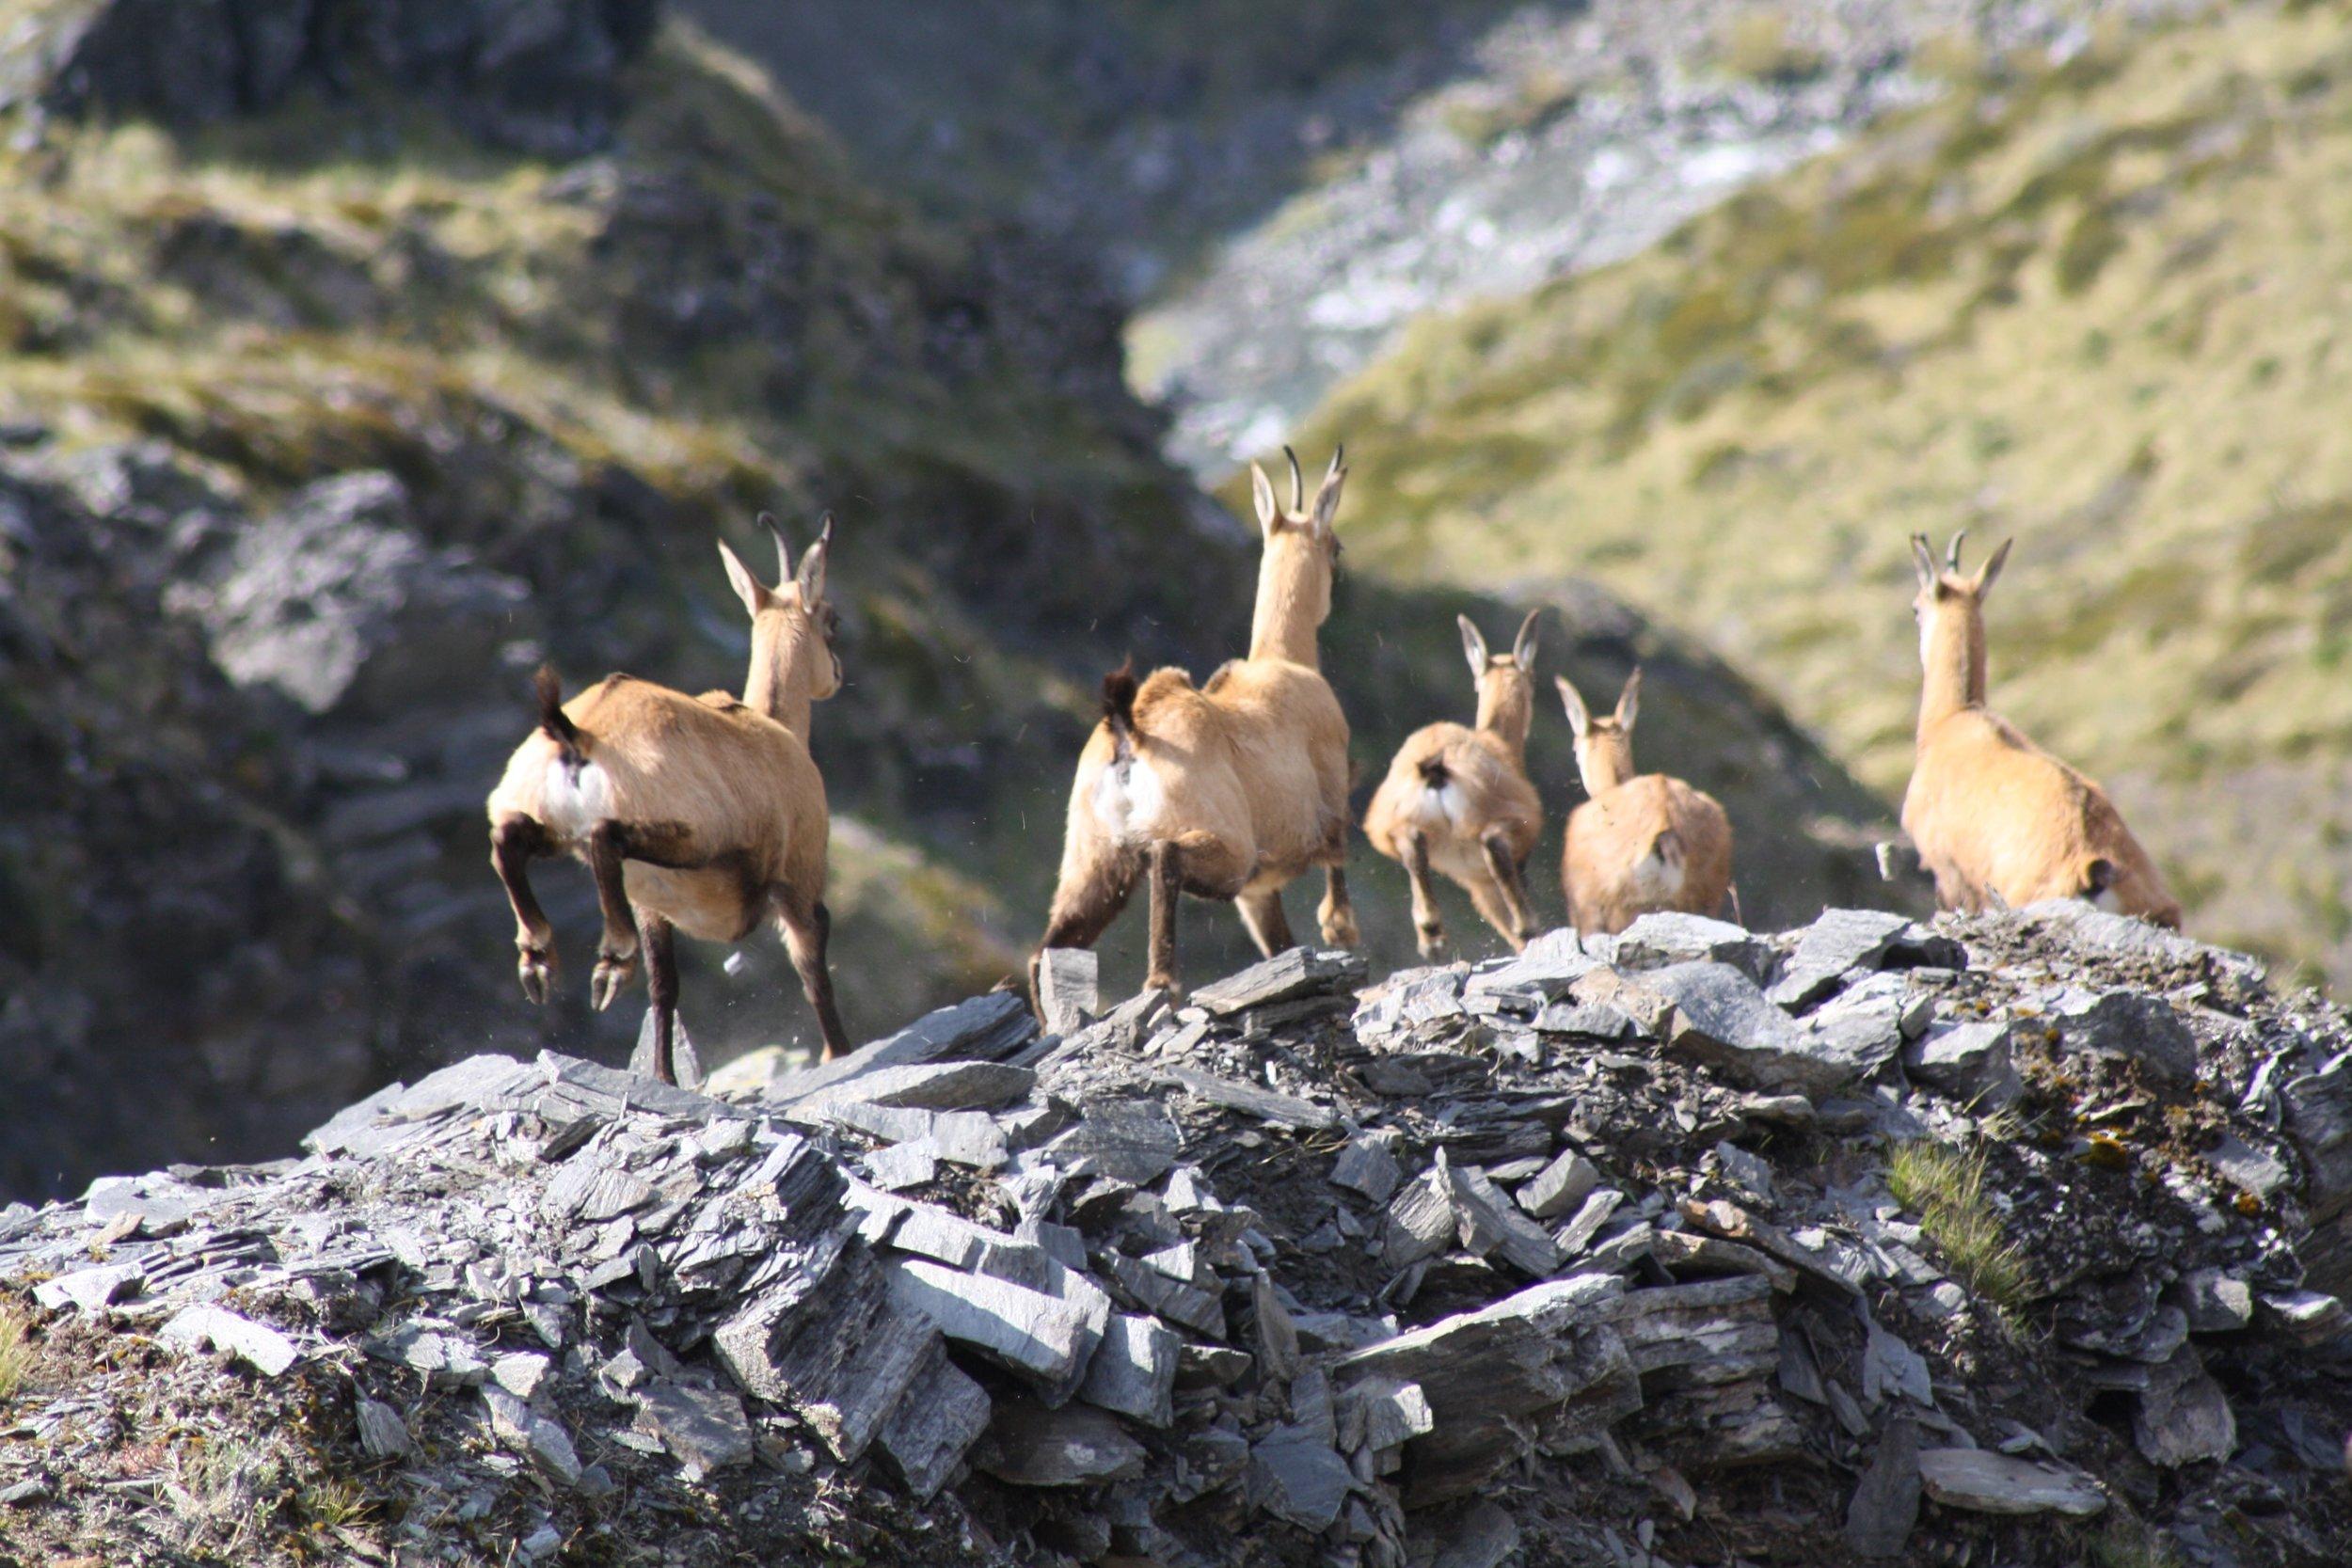 Fleeing chamois, no nuts here! Image @ Hugh Bagley